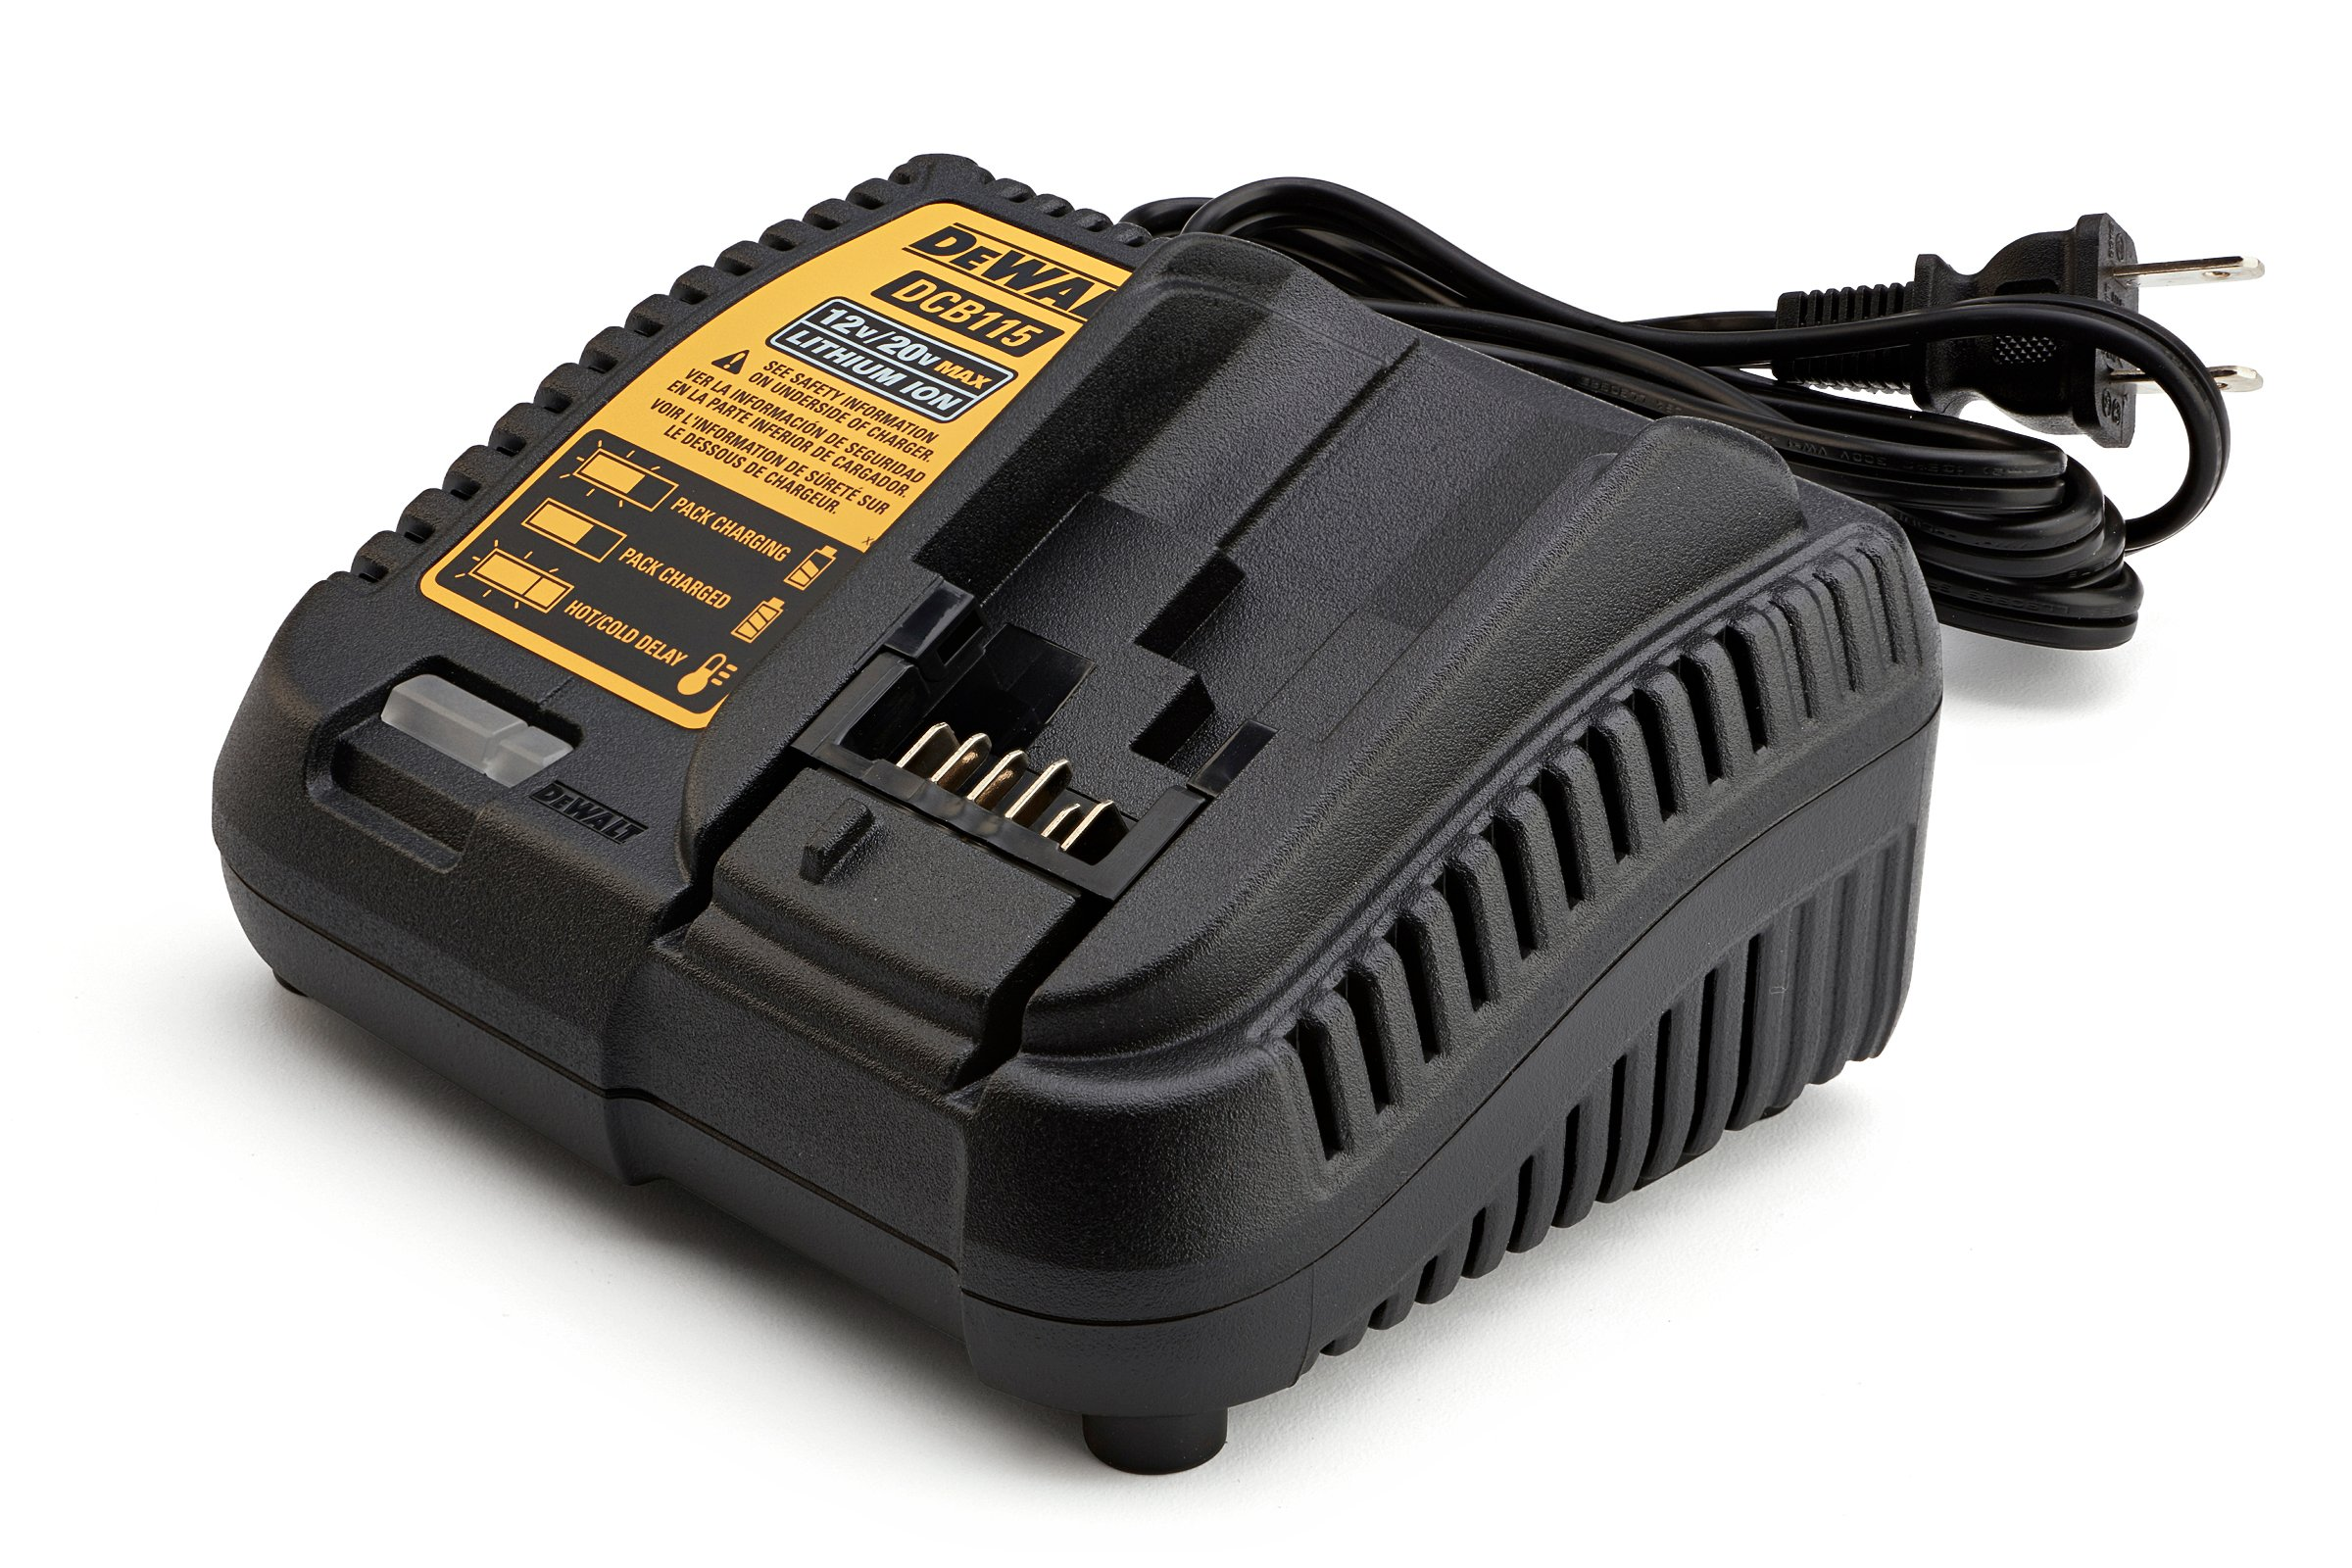 DEWALT DCB115 Lithium Battery Charger